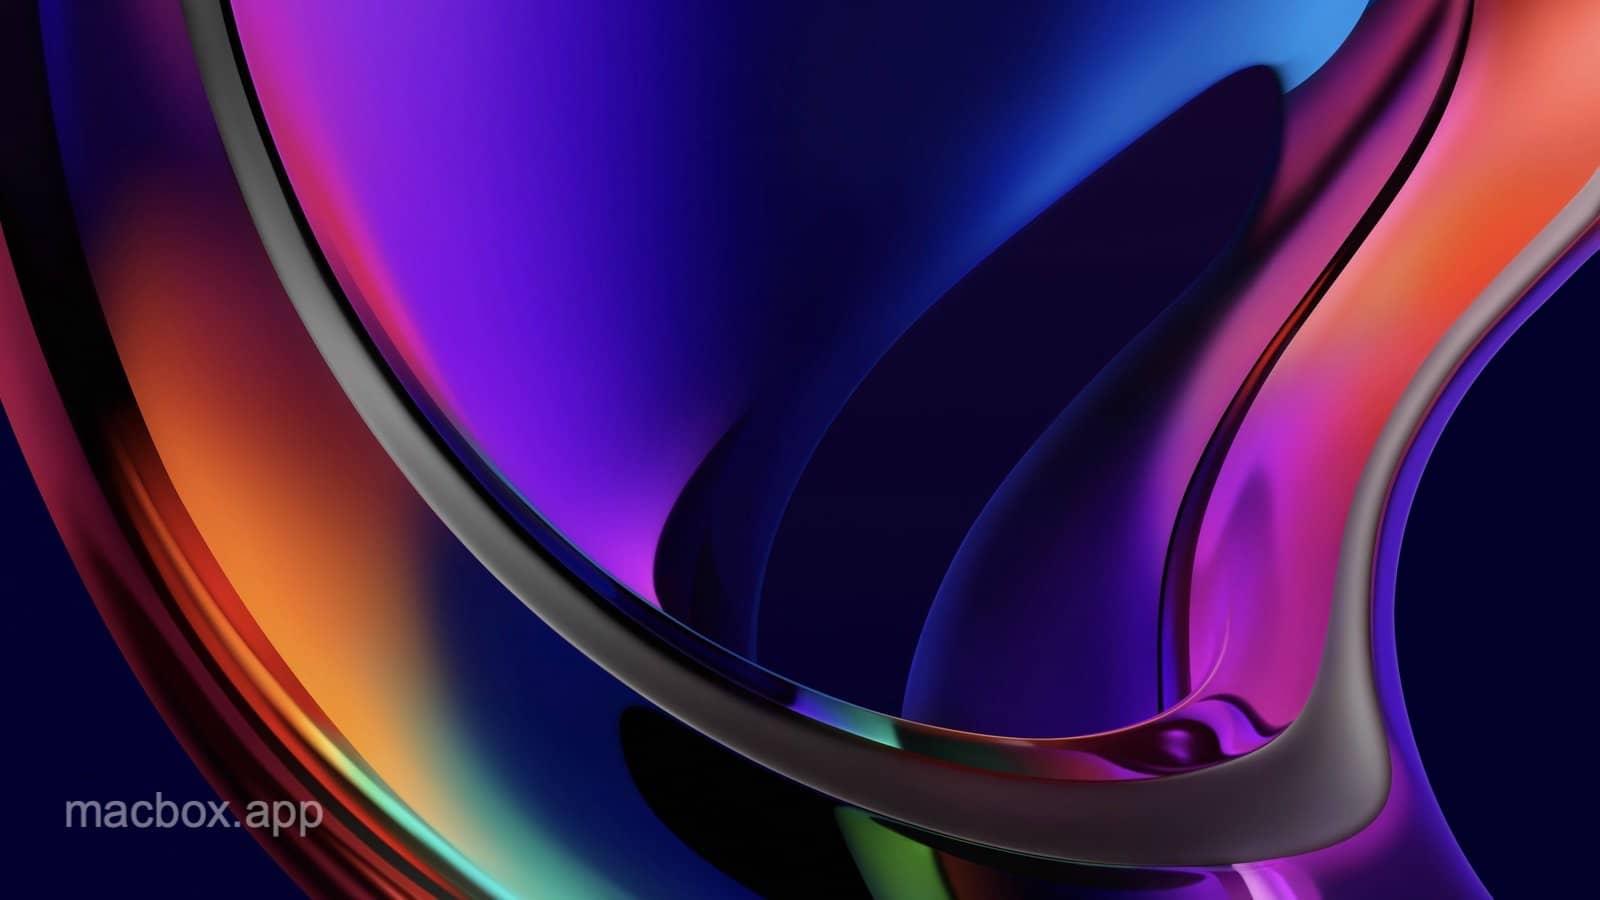 macOS Big Sur iridescence 彩霞动态壁纸